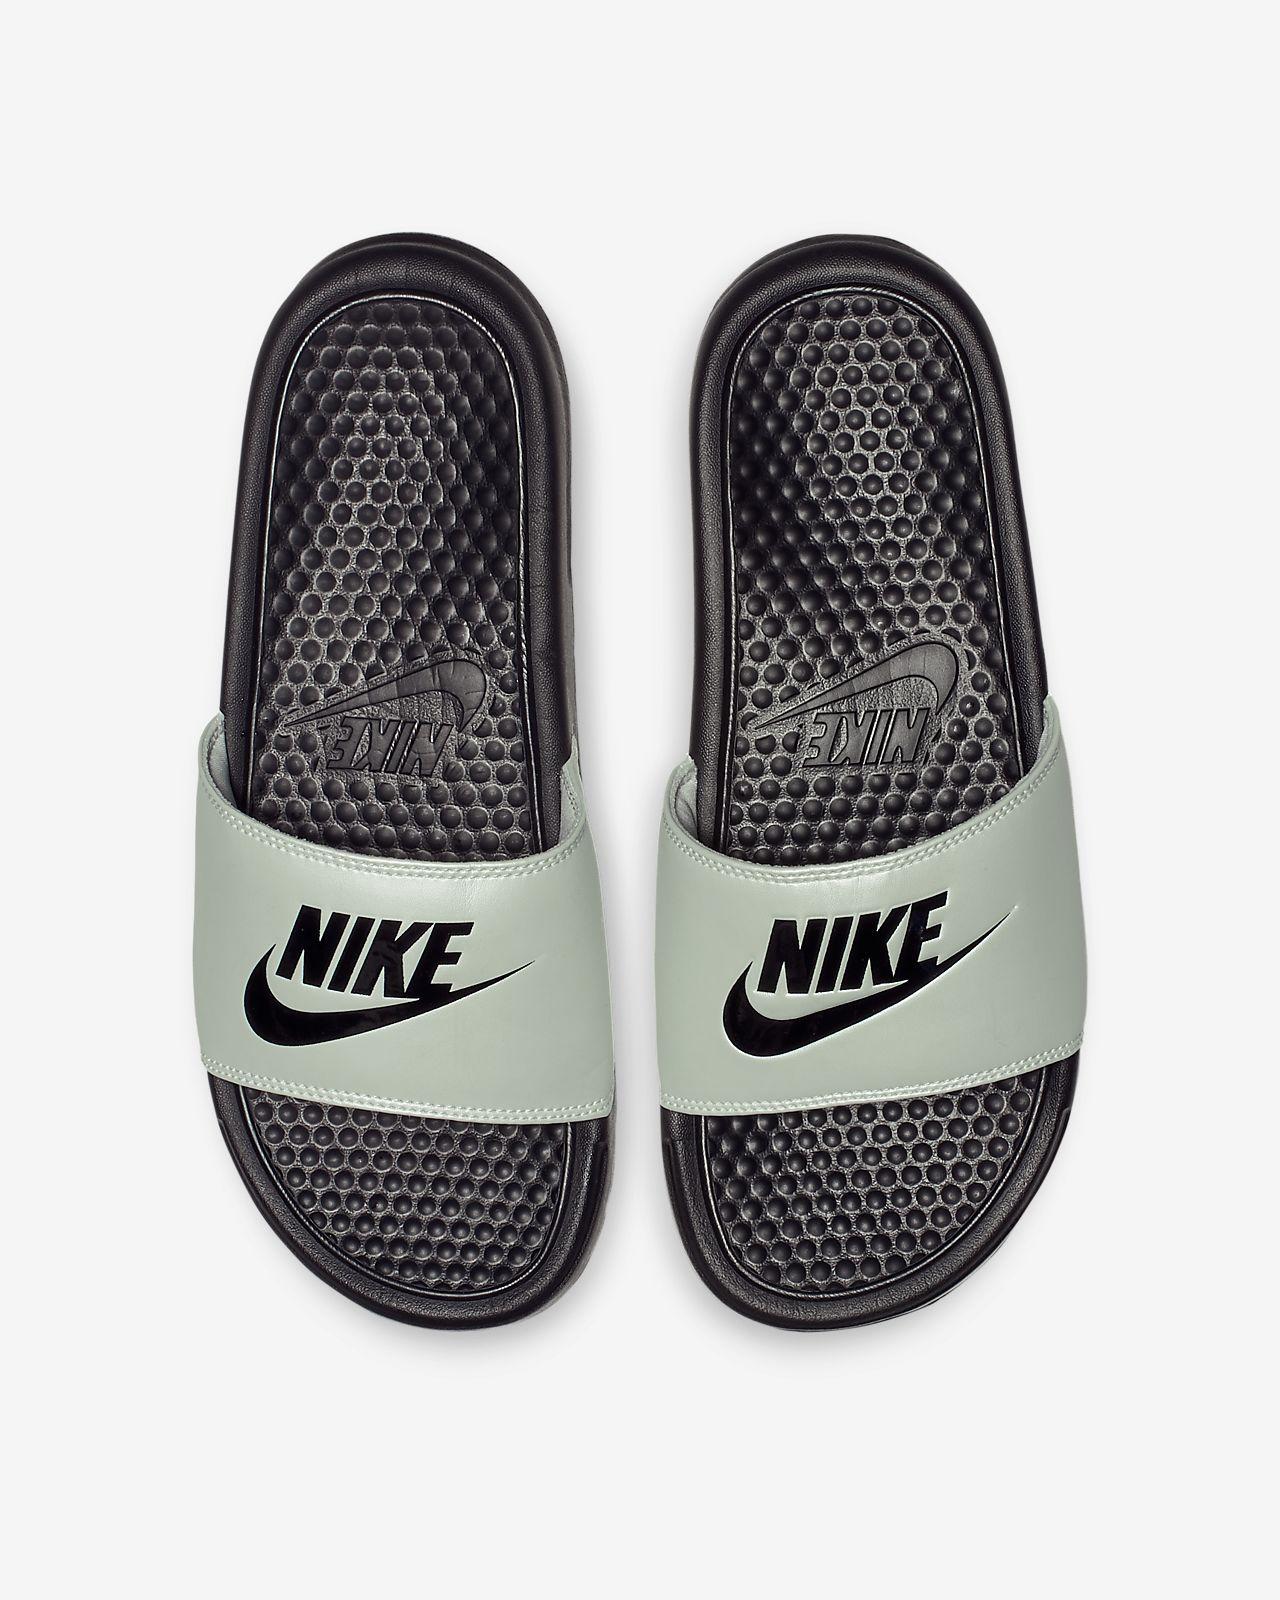 59dadd77432b1 Low Resolution Nike Benassi Women s Slide Nike Benassi Women s Slide